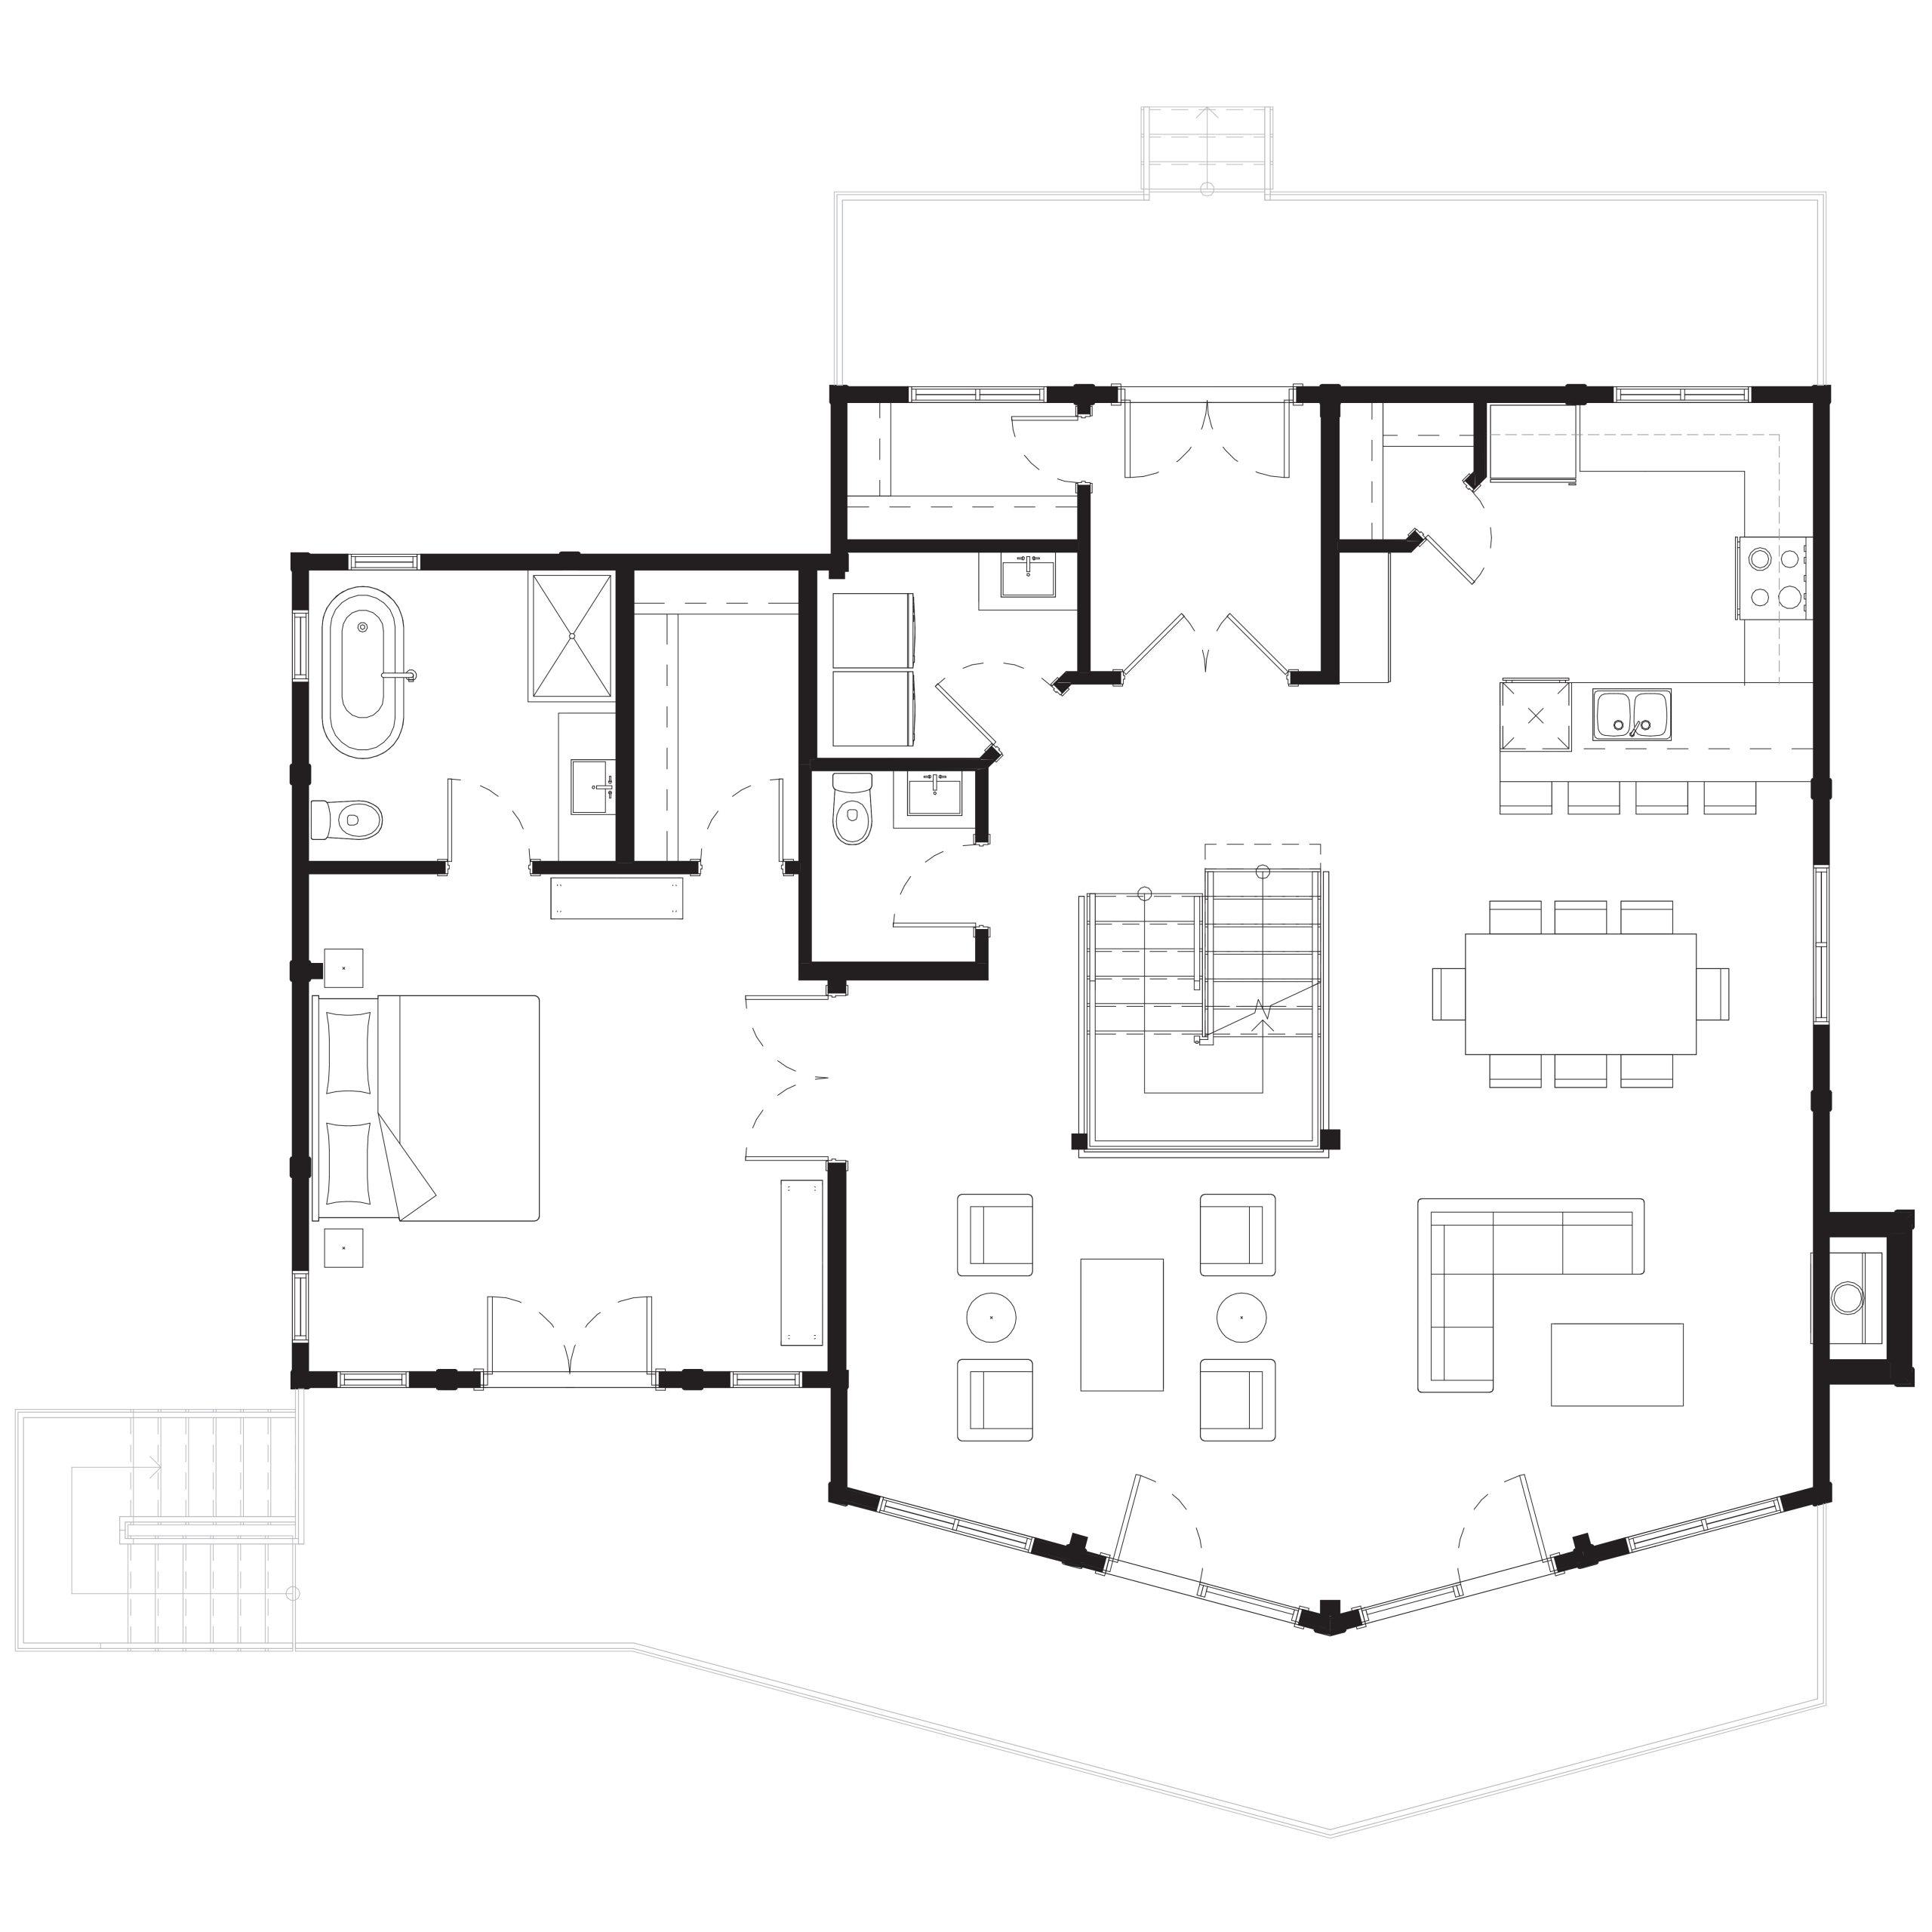 Labrador Floorplan